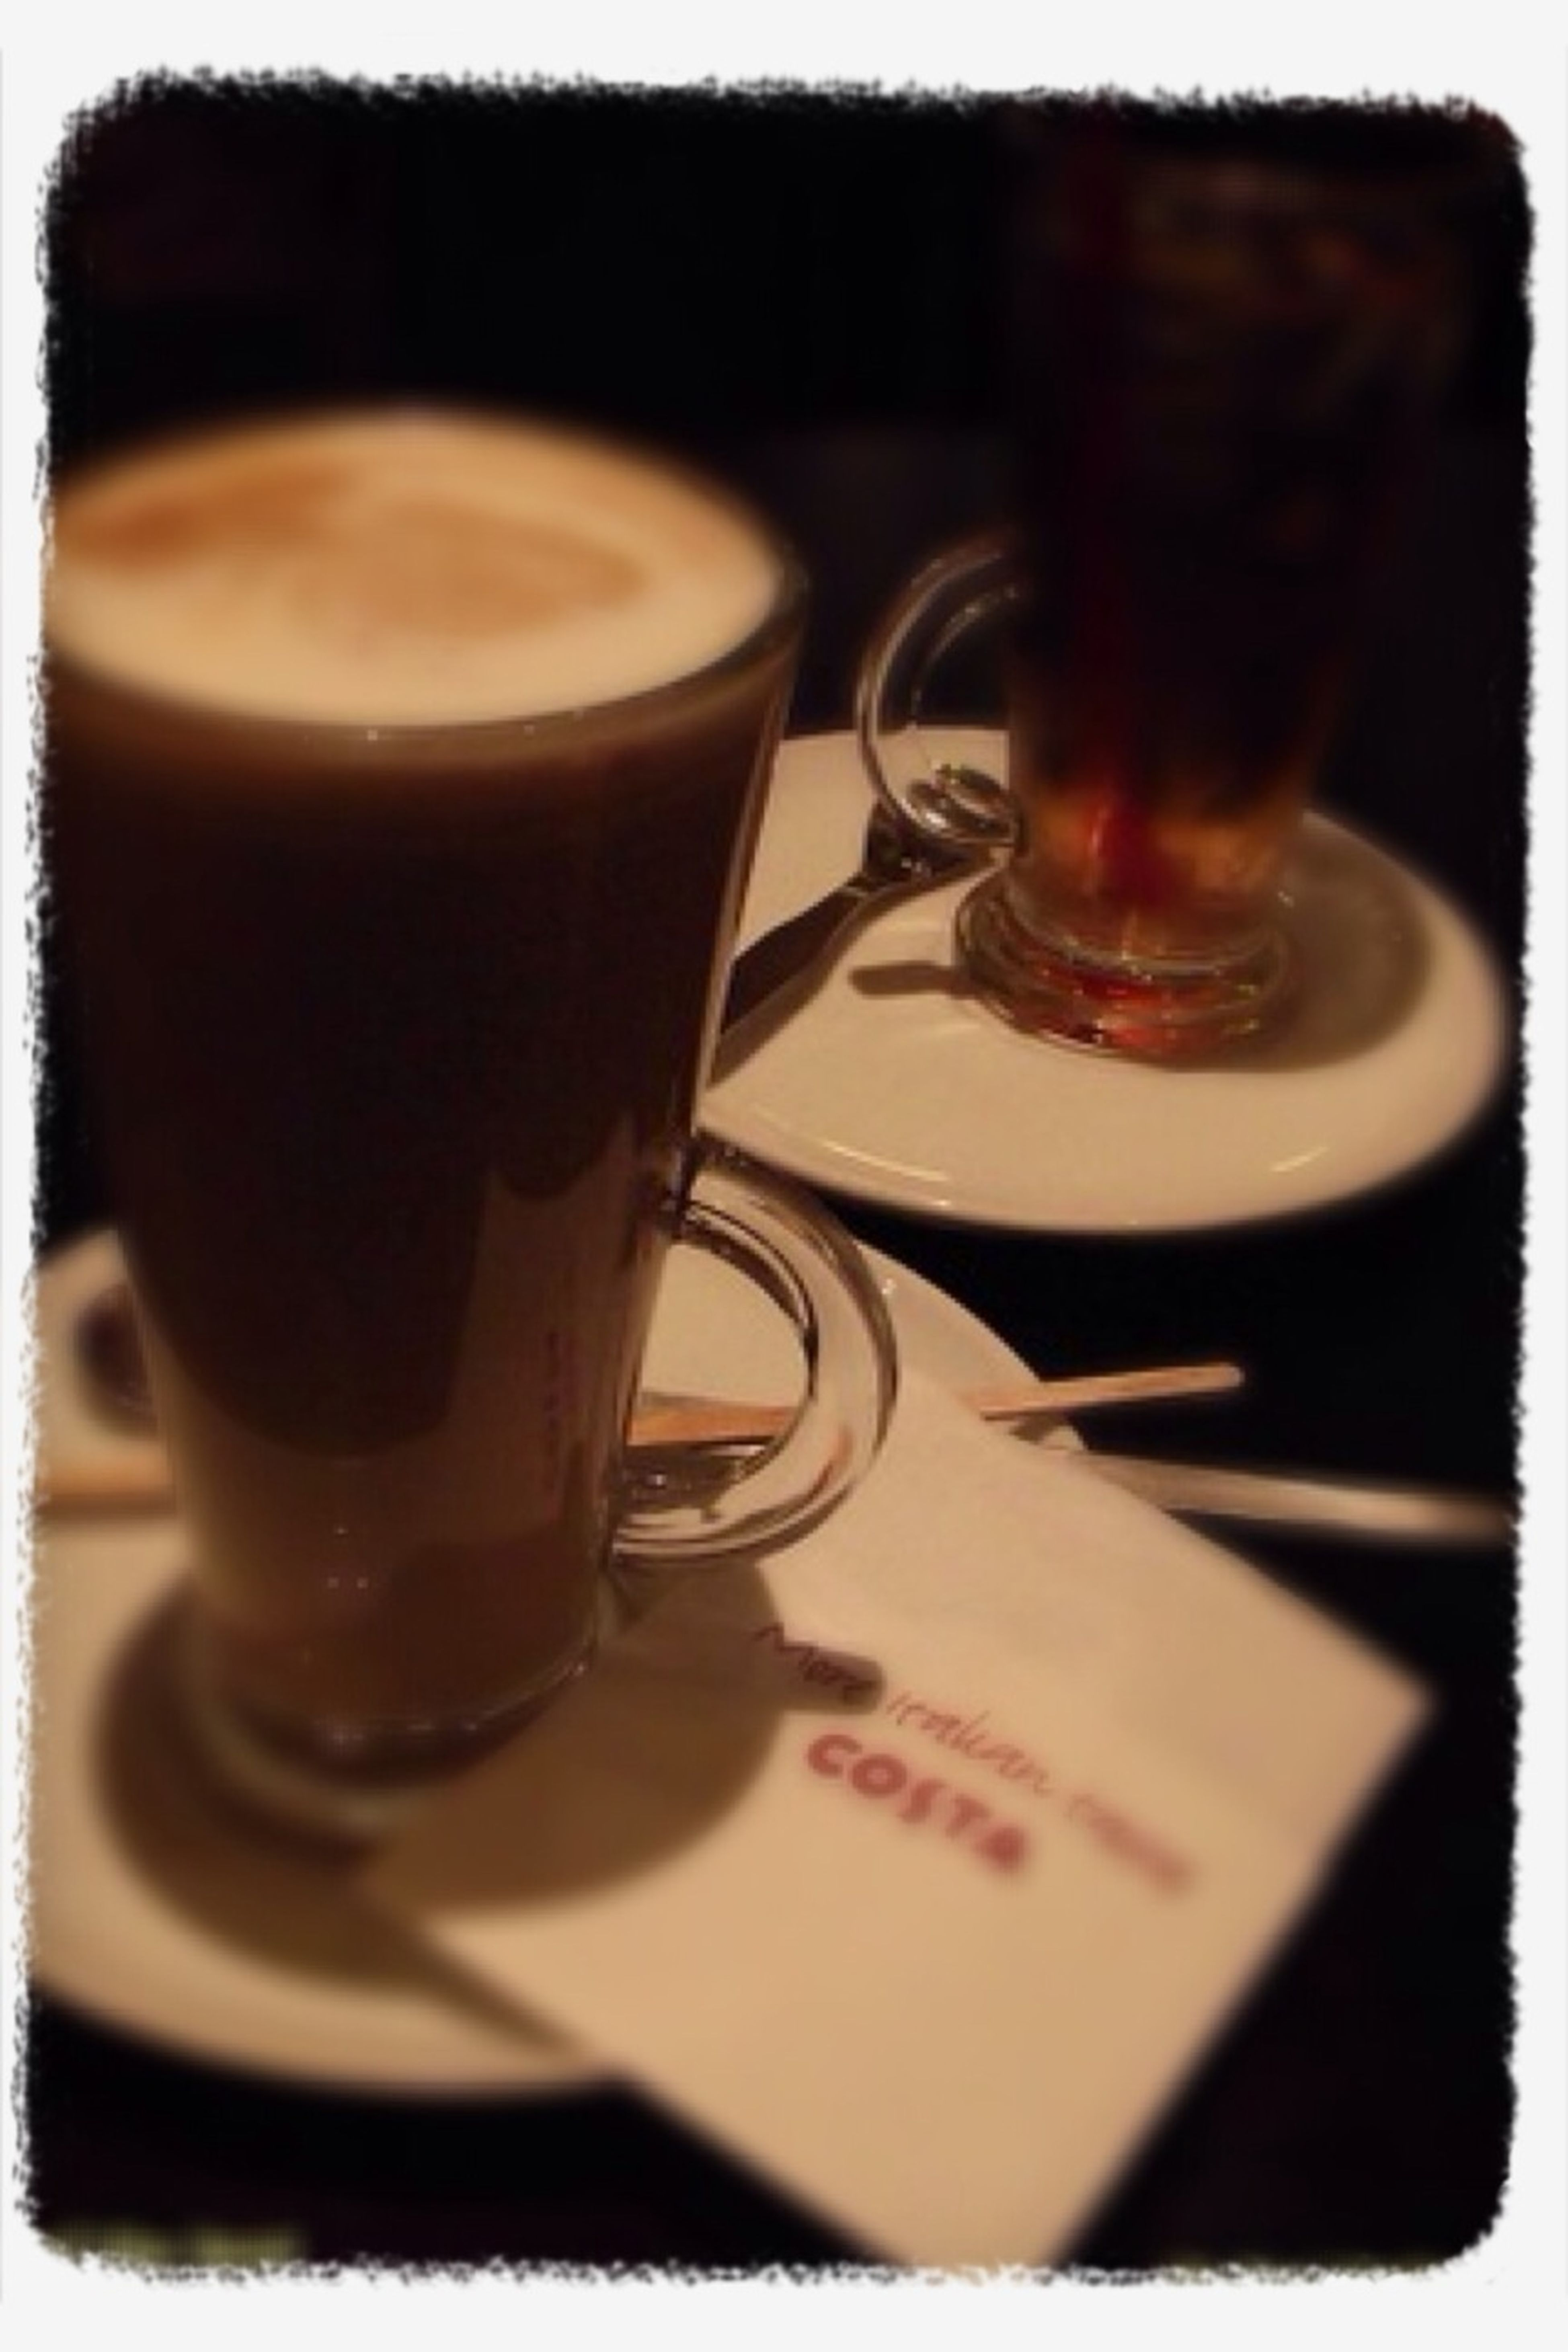 A Nice Cappuccino